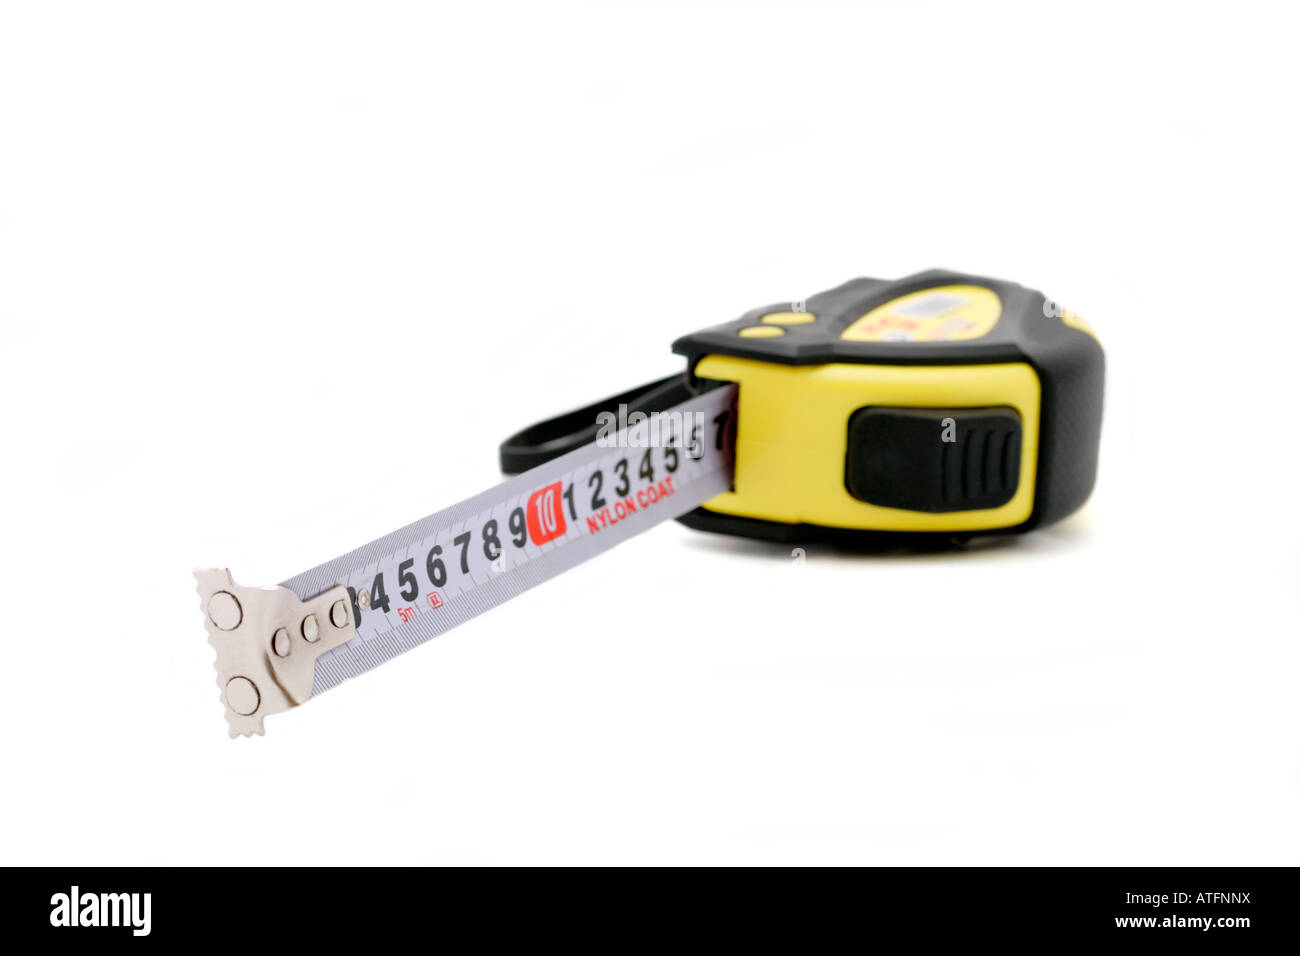 Builder Mend Fix Meter Cm Inch Plastic Ruler Rule Units Tape Measure